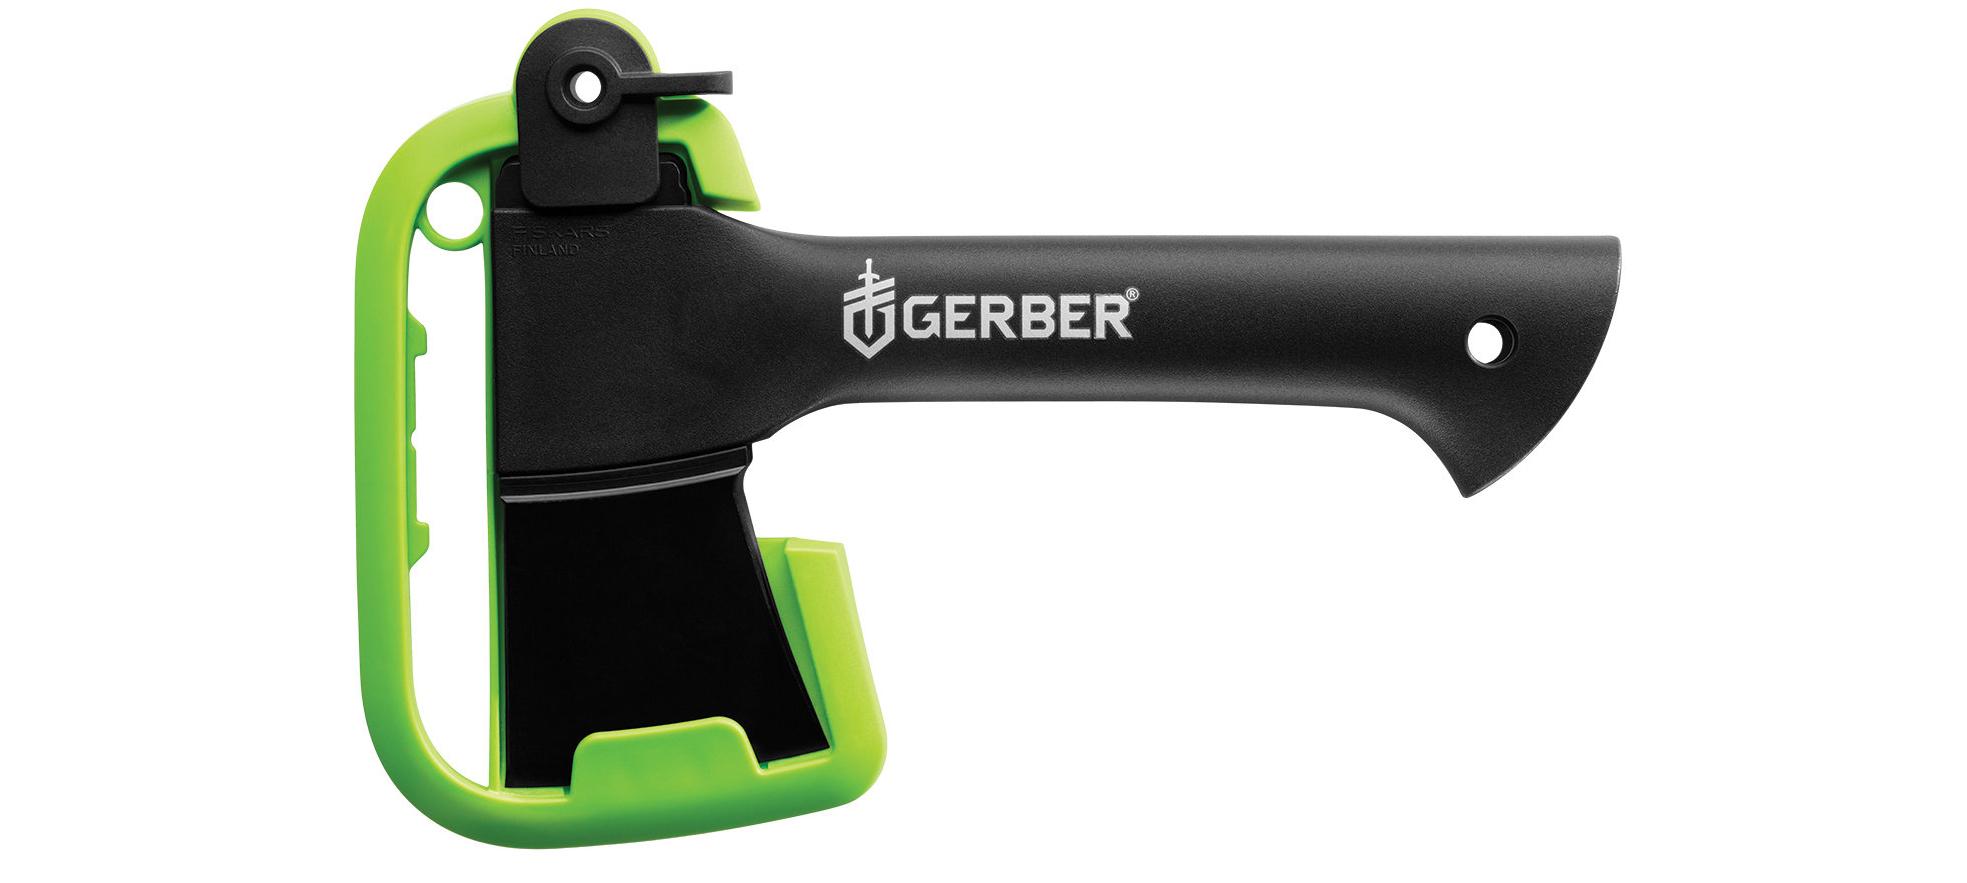 Toporek Gerber Gear 9 Back Paxe II wraz z osłonką ostrza